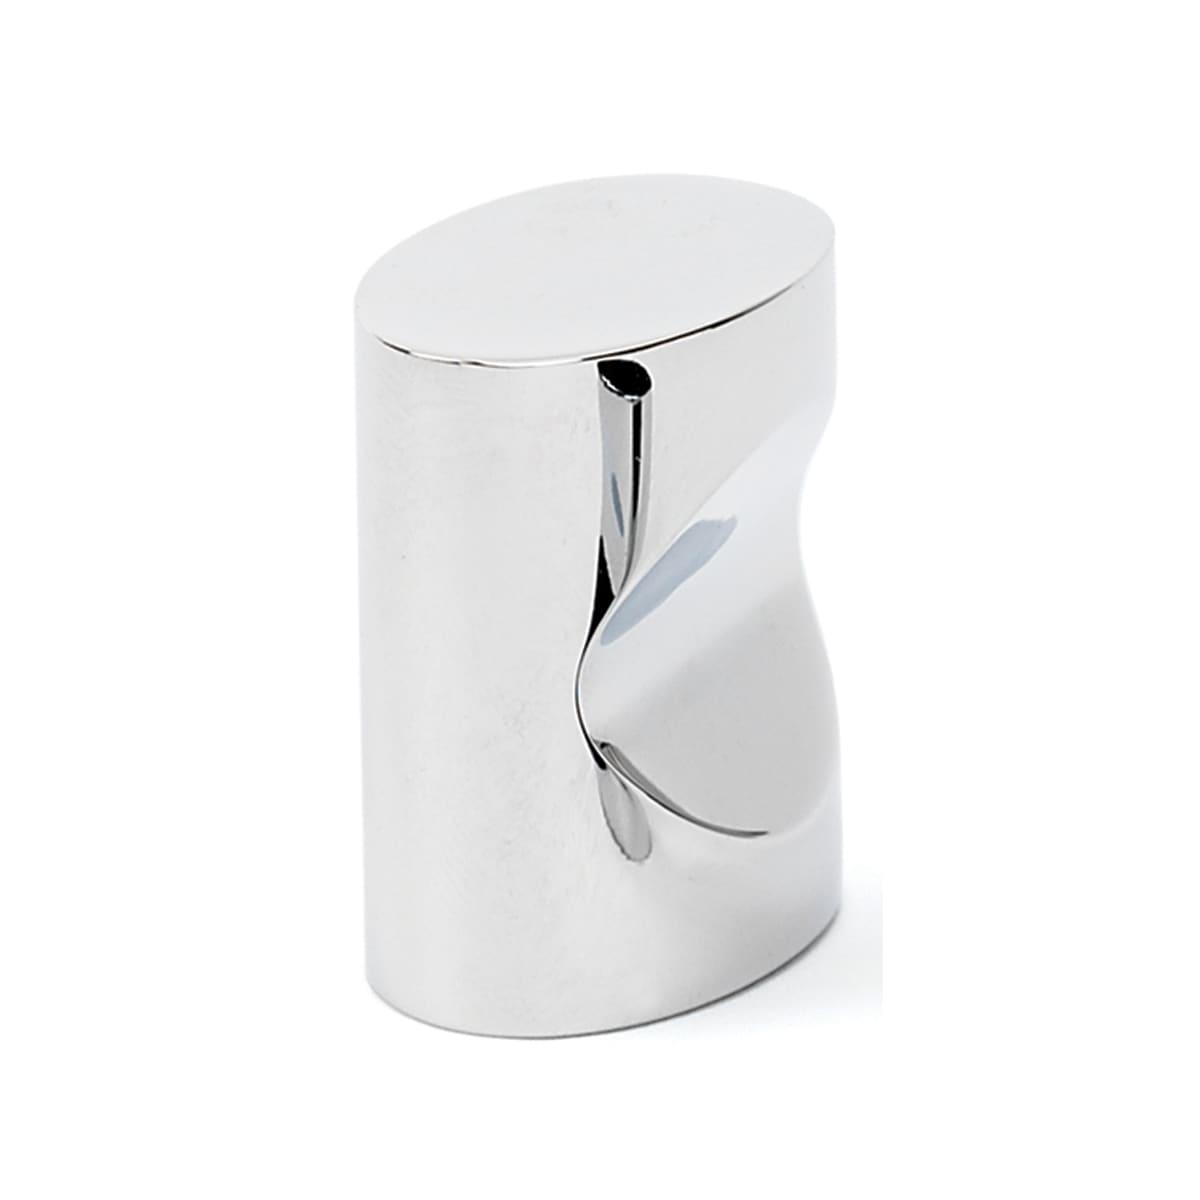 Alno Contemporary III 1 Inch Oval Cabinet Knob